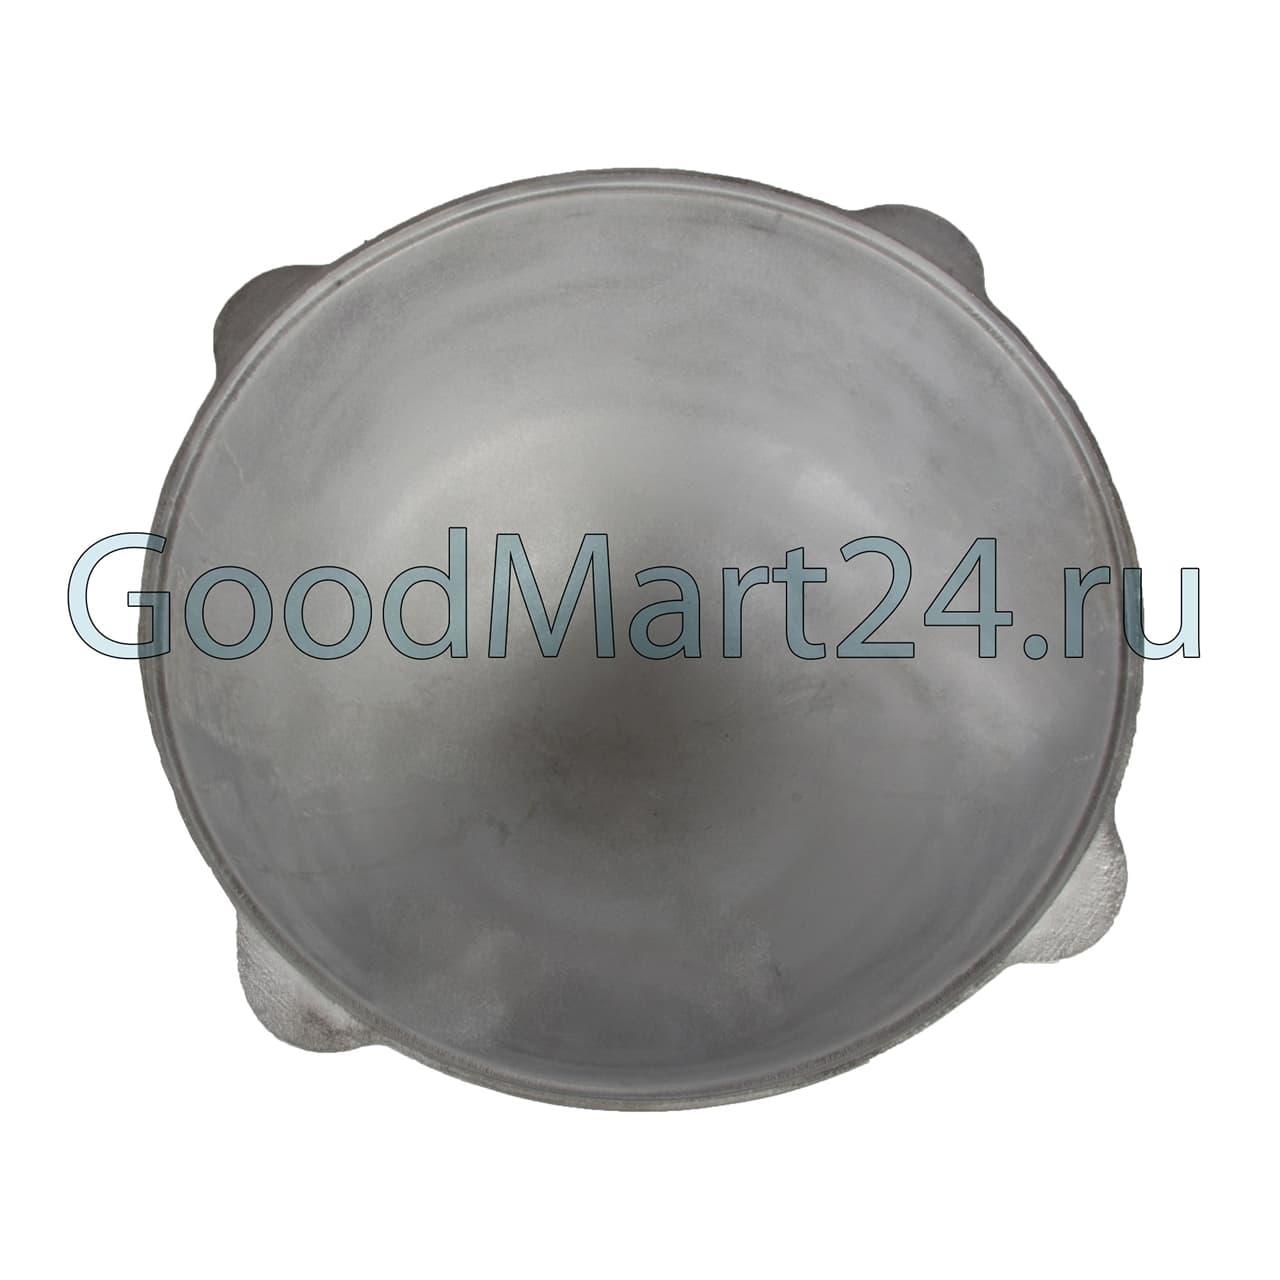 Алюминиевый казан 70 л. Балезинский ЛМЗ - фото 4629